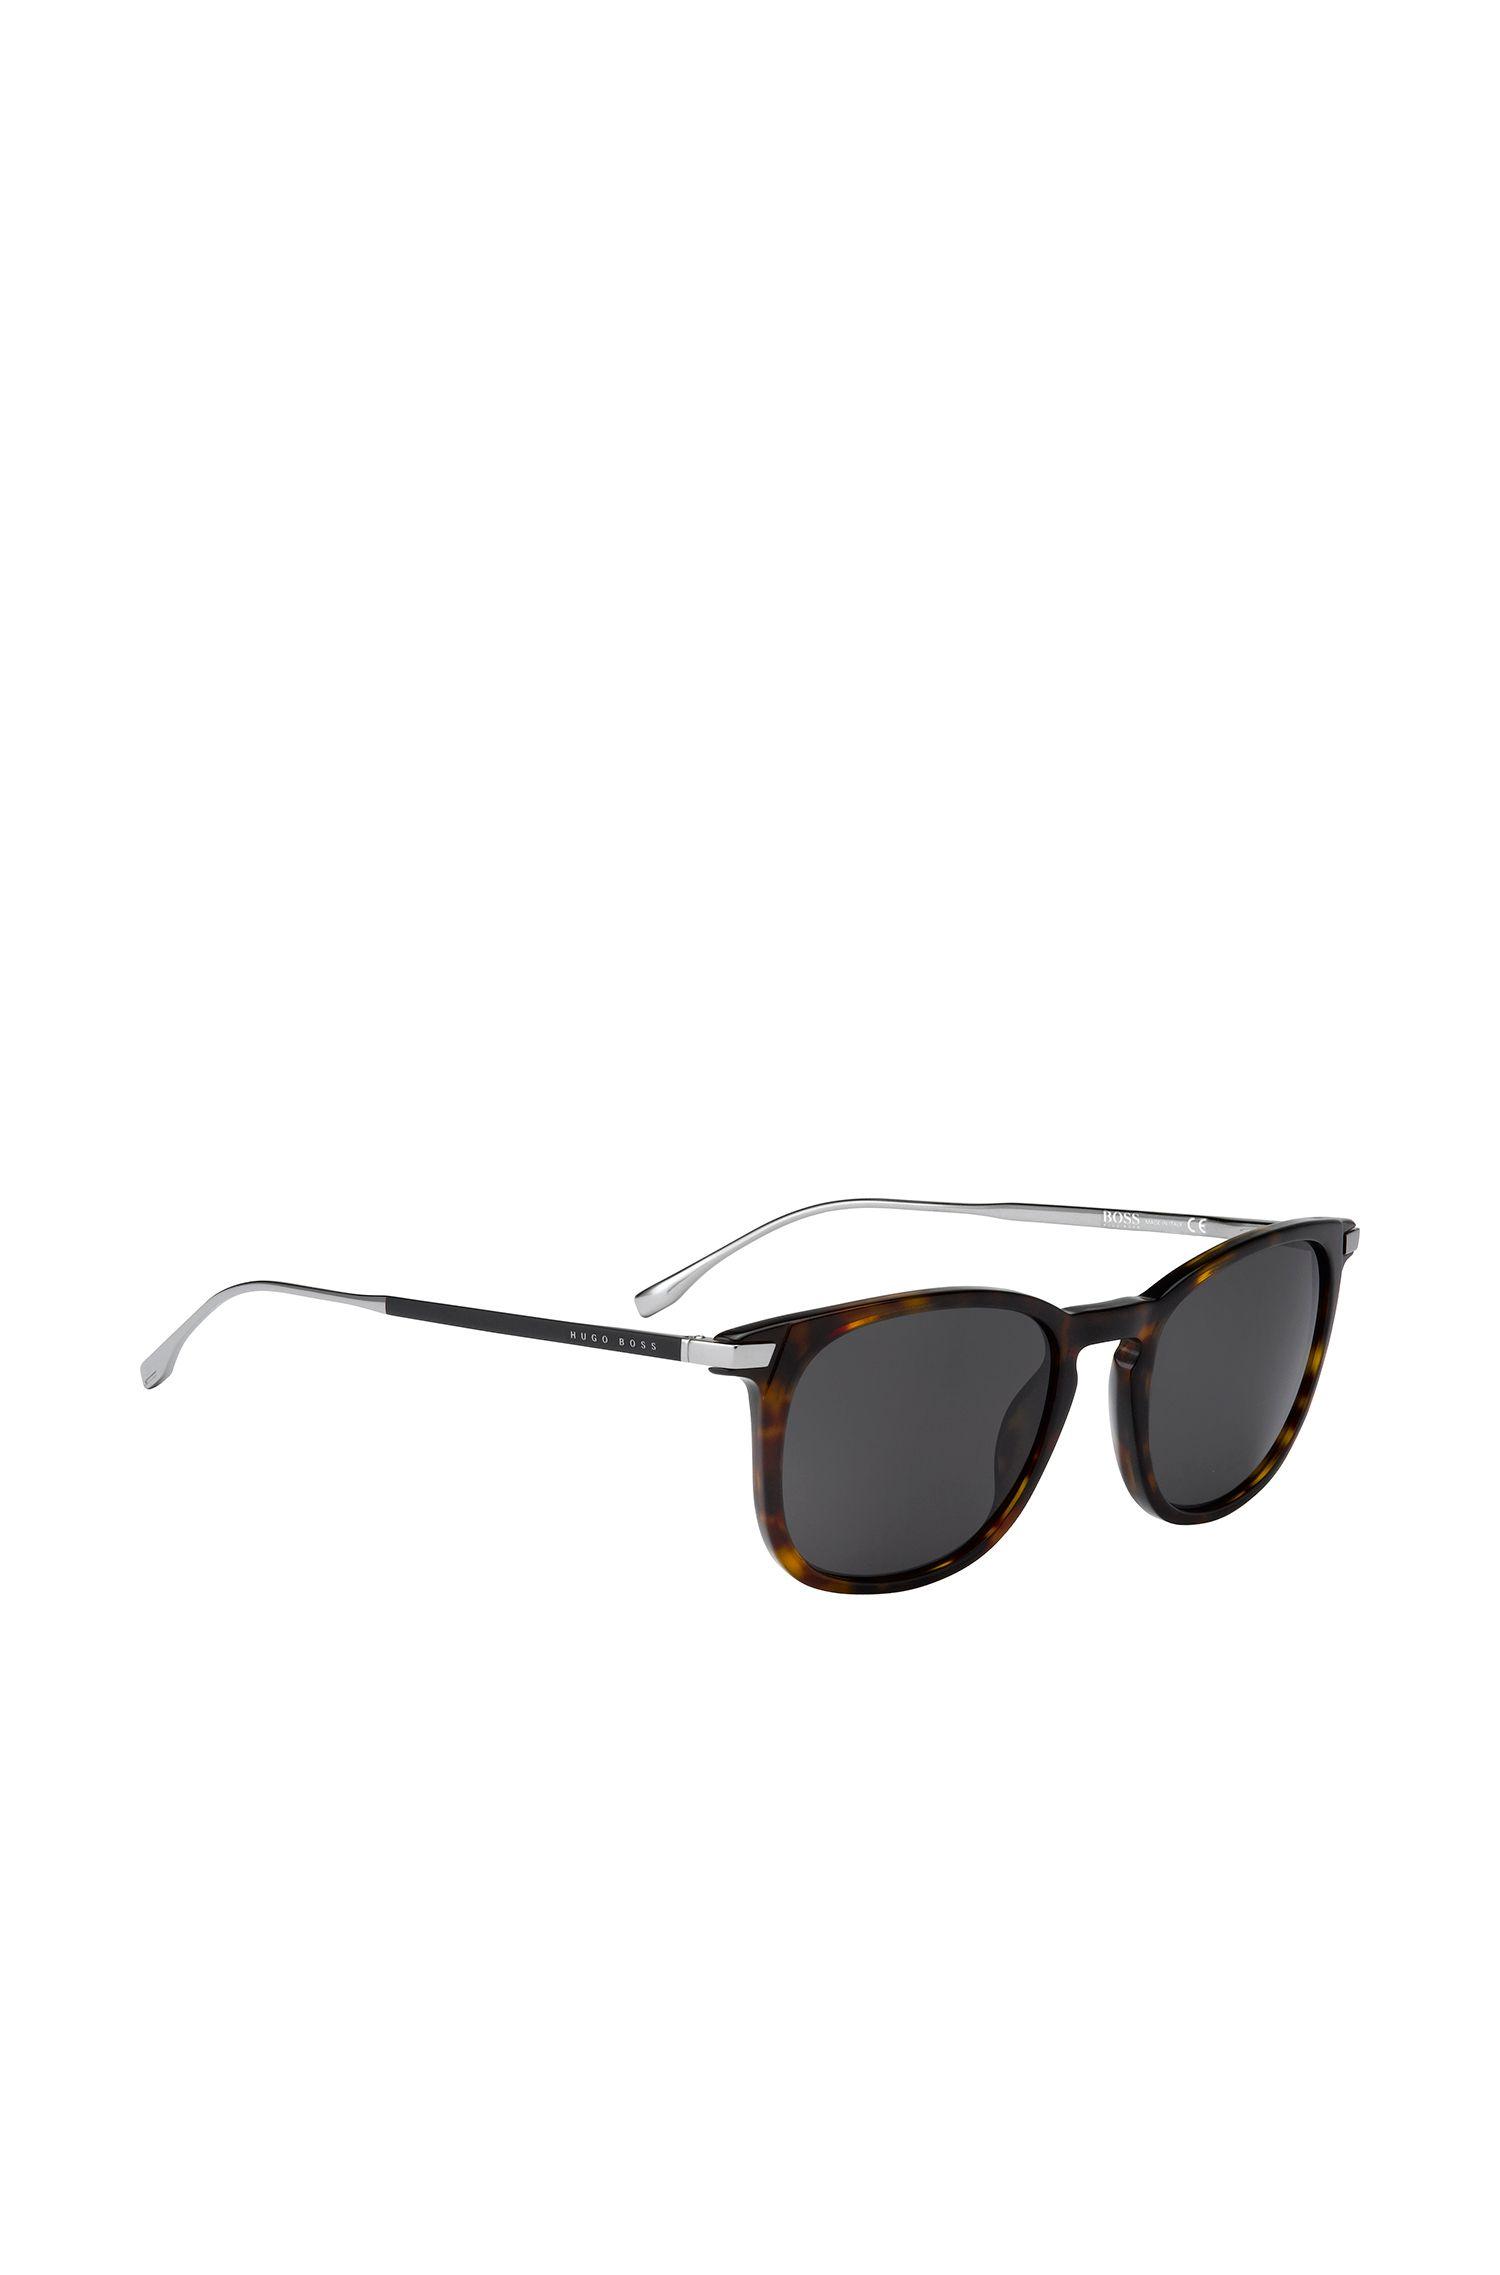 'BOSS 0783S' | Gray Lens Acetate Sunglasses